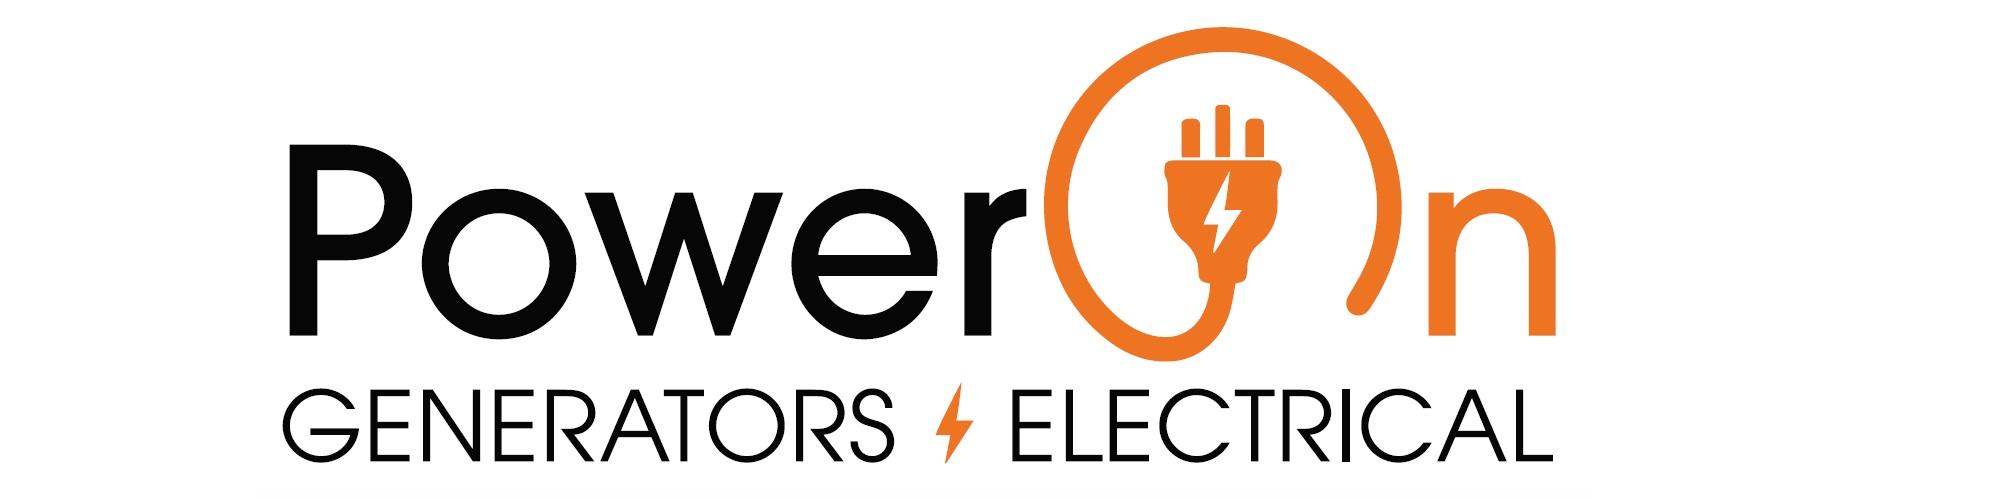 PowerOn Generators Cleveland